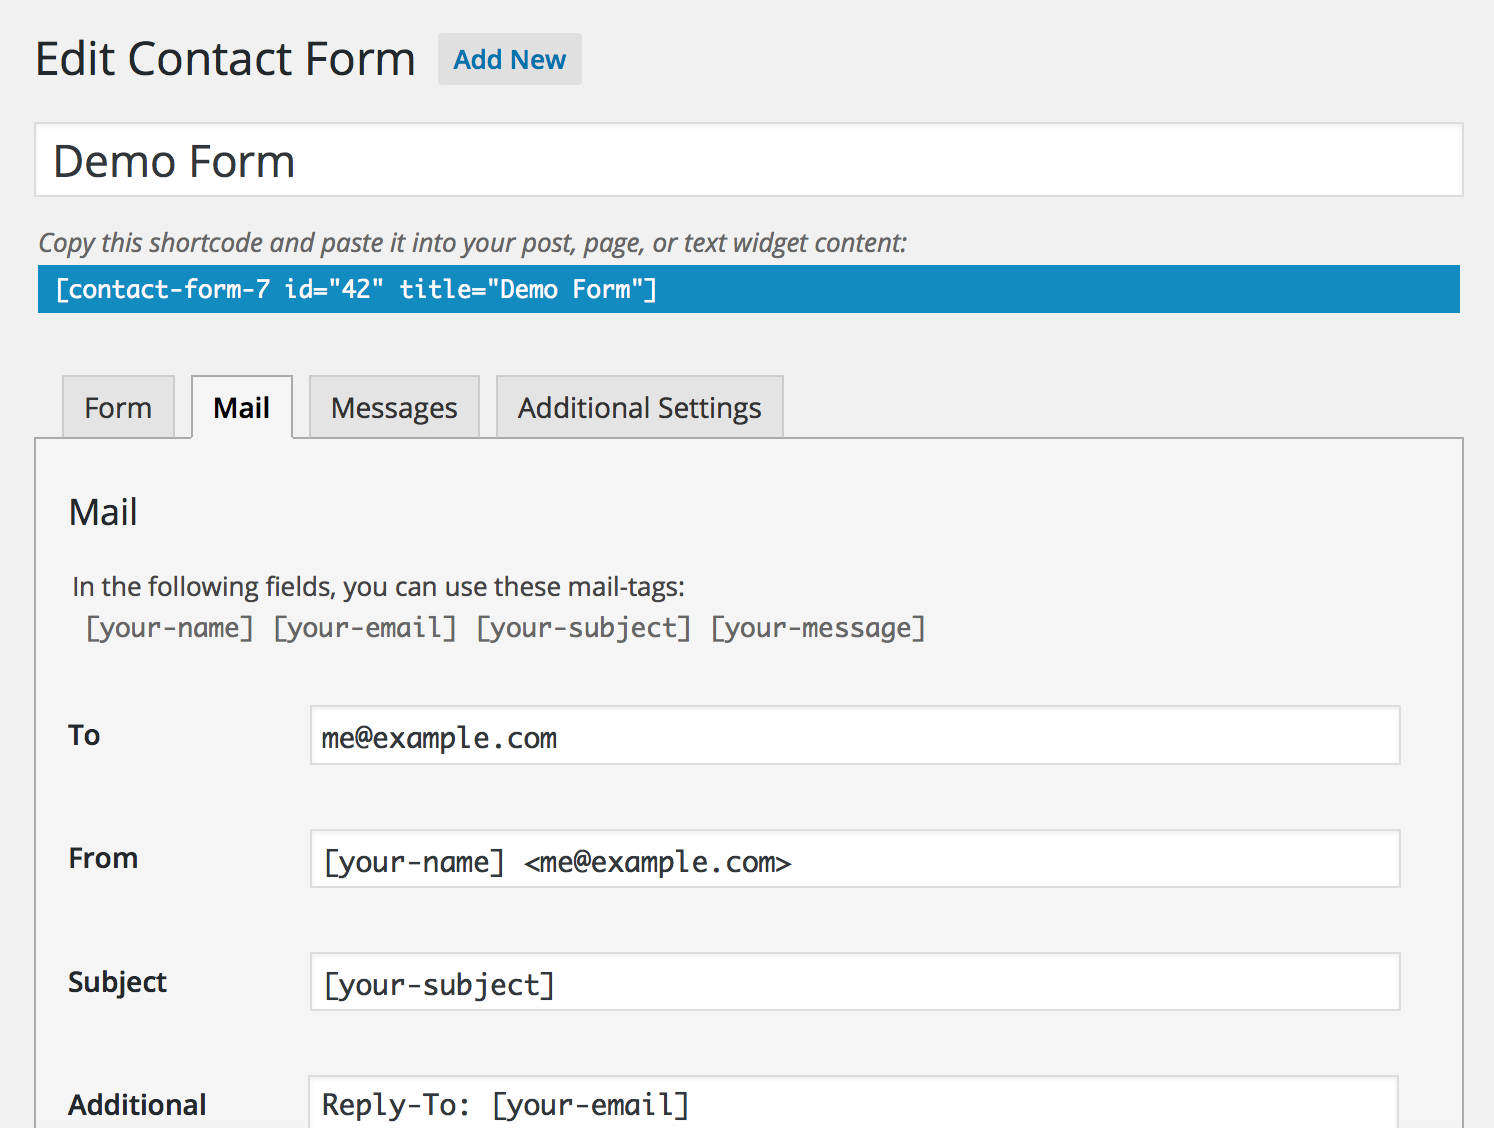 Screenshot image of the mail tab